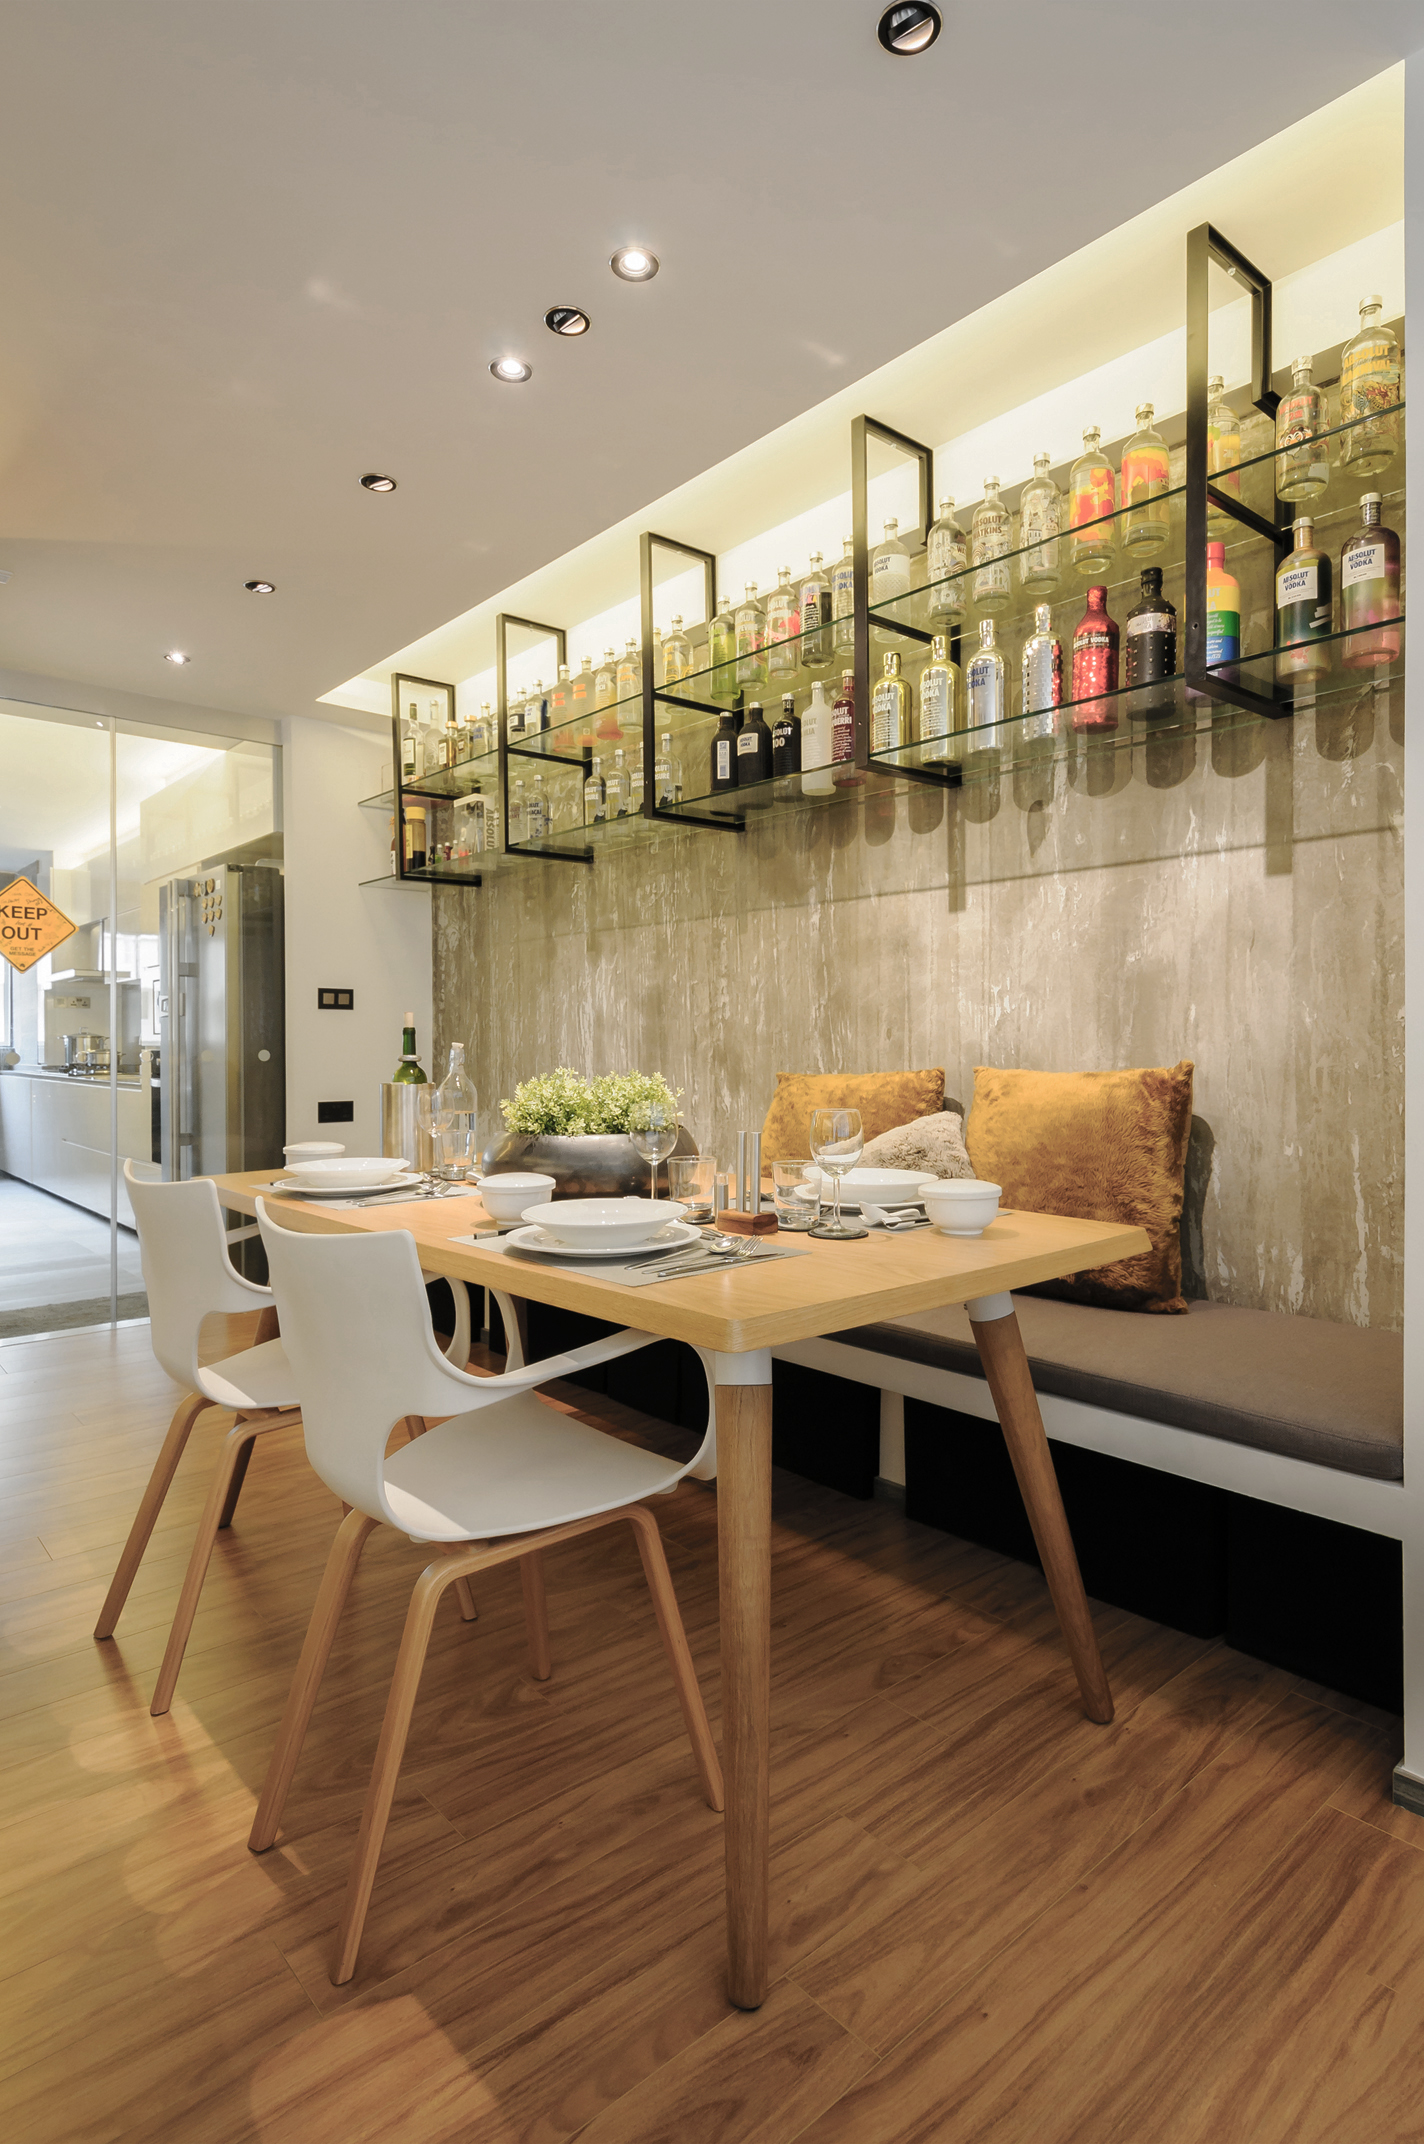 3 Dining Area